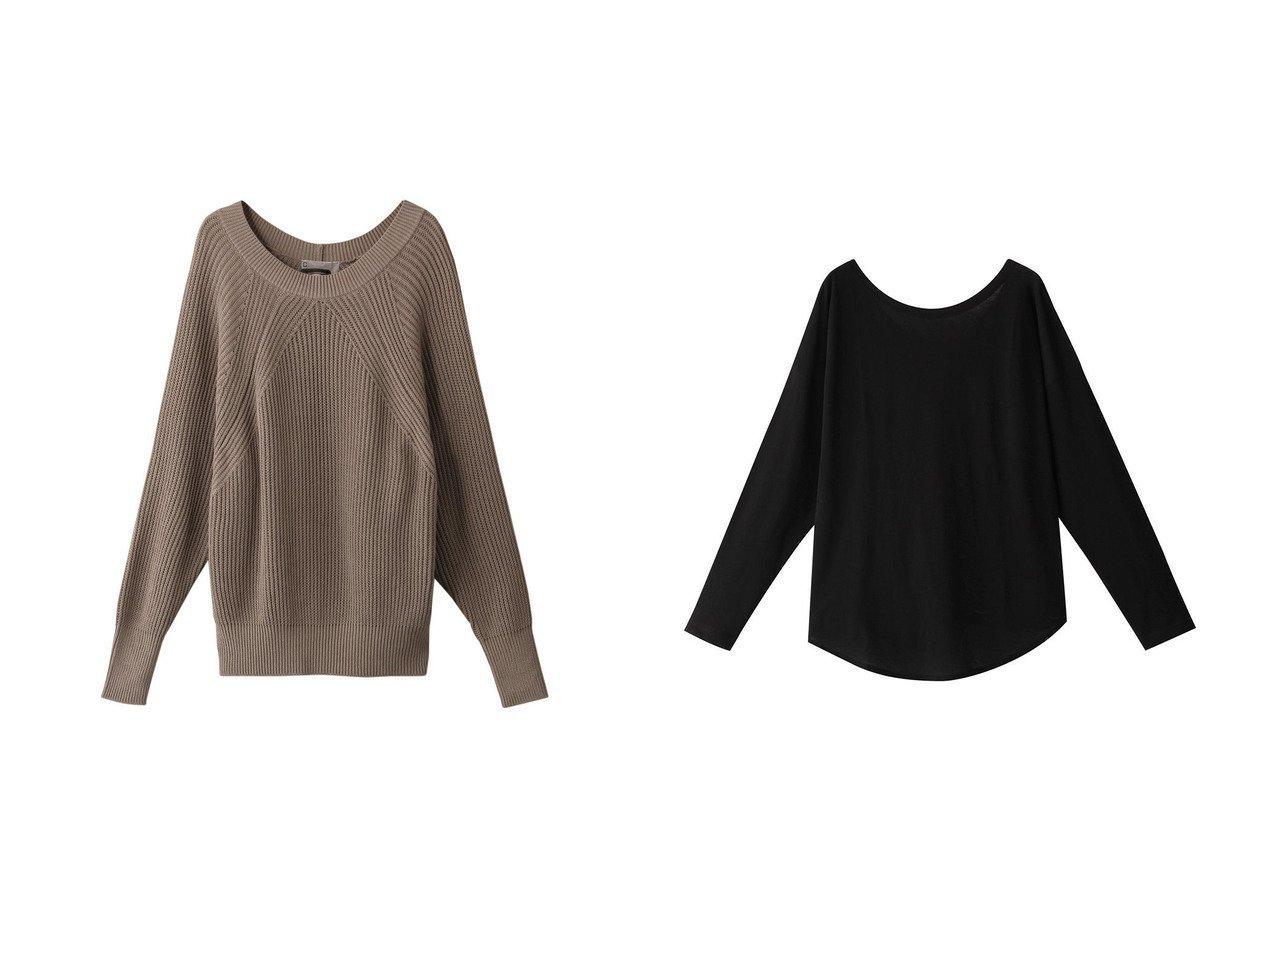 【Chaos/カオス】のCR5Gソフルアゼニットプルオーバー&CRスーピマコットンLST 【トップス・カットソー】おすすめ!人気、トレンド・レディースファッションの通販   おすすめで人気の流行・トレンド、ファッションの通販商品 メンズファッション・キッズファッション・インテリア・家具・レディースファッション・服の通販 founy(ファニー) https://founy.com/ ファッション Fashion レディースファッション WOMEN トップス・カットソー Tops/Tshirt ニット Knit Tops プルオーバー Pullover シャツ/ブラウス Shirts/Blouses 2021年 2021 2021春夏・S/S SS/Spring/Summer/2021 S/S・春夏 SS・Spring/Summer デニム トレンド 春 Spring |ID:crp329100000026656